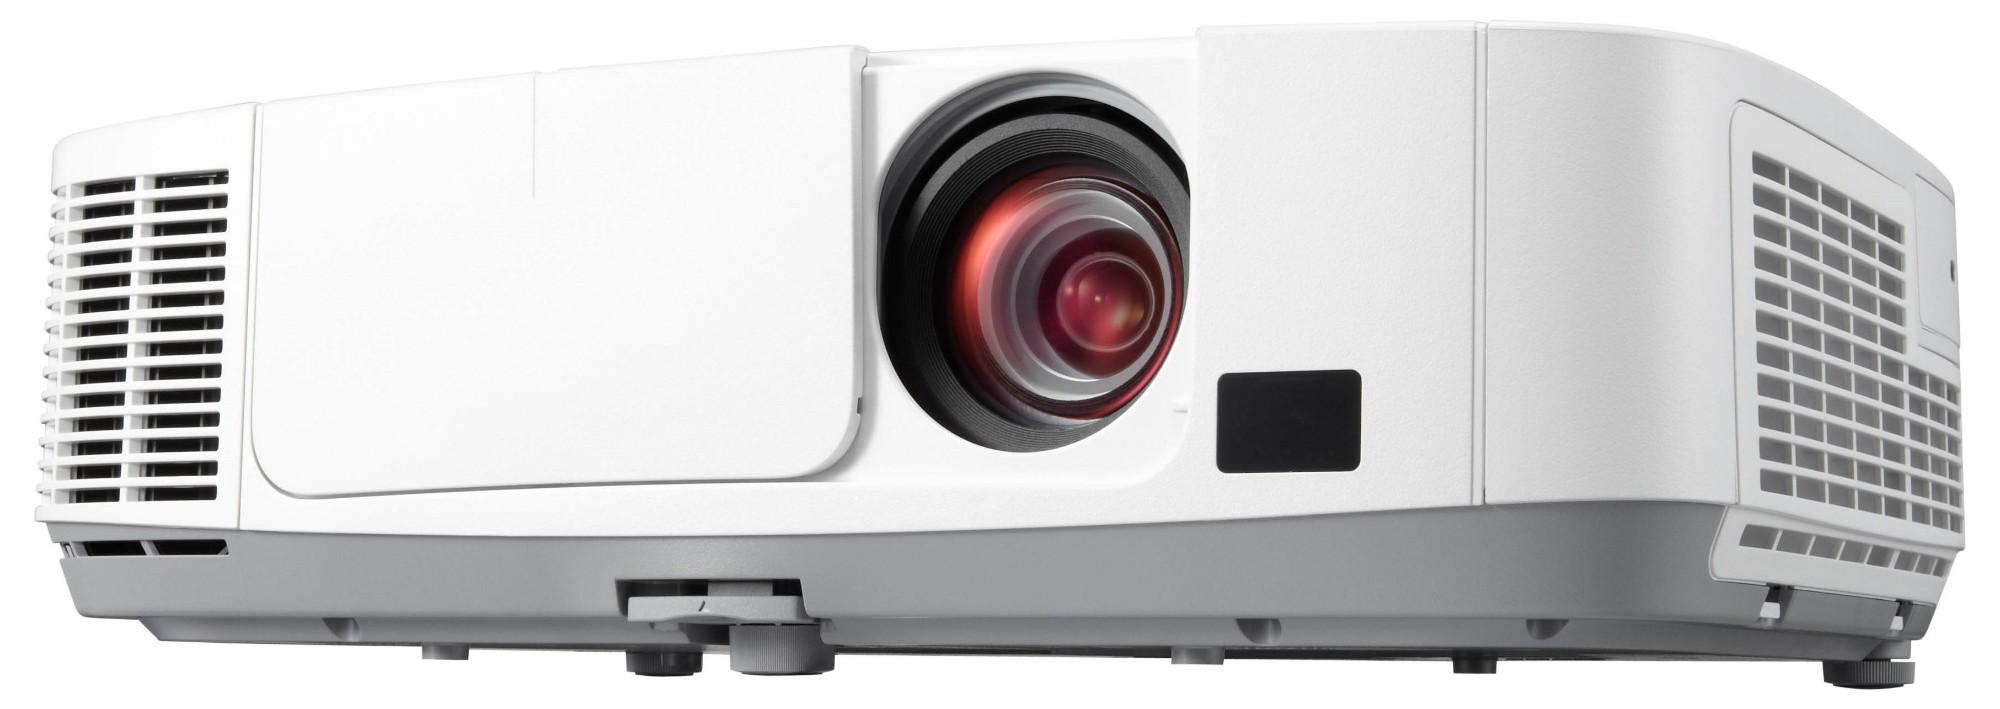 NEC P451W 4000ANSI lumens 3LCD WXGA (1280x800) Desktop projector White